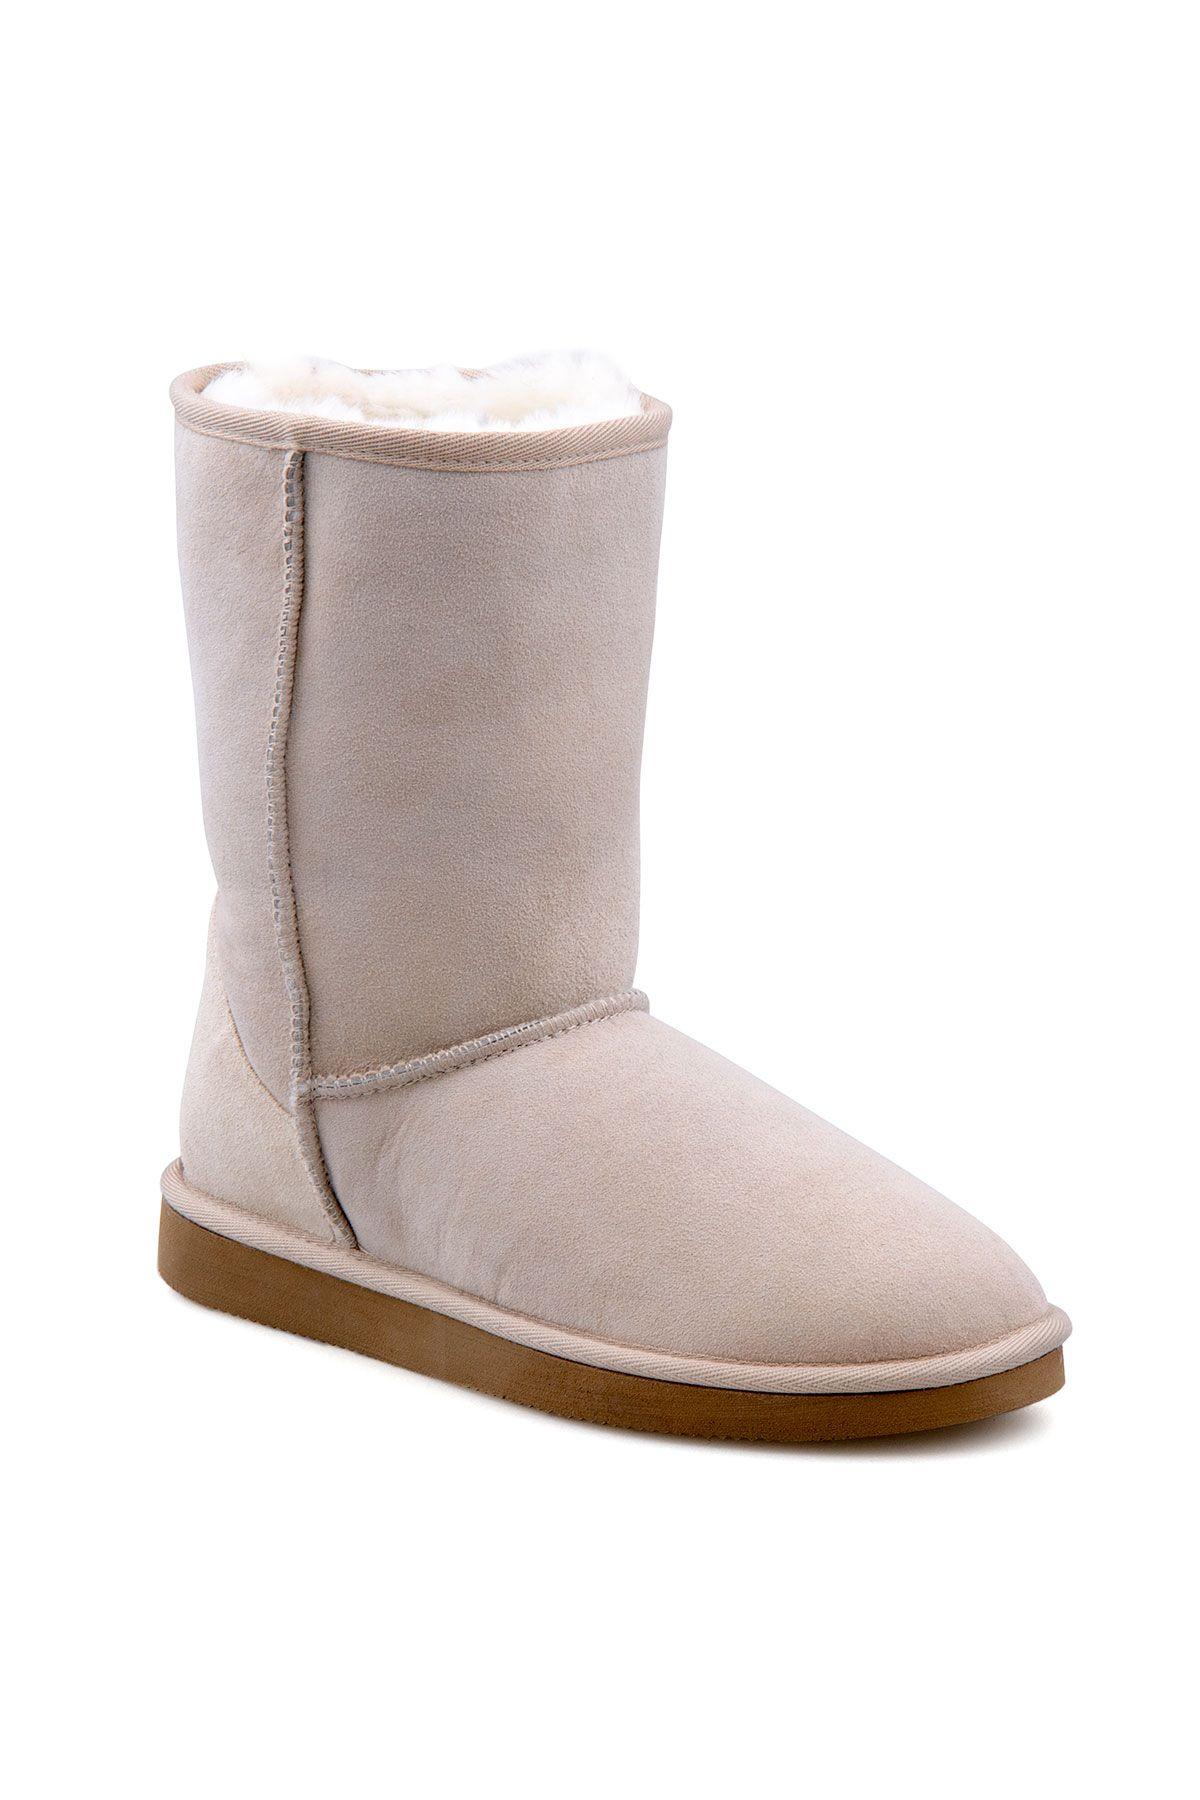 Pegia Genuine Sheepskin Classic Women's Boots 191011 Beige